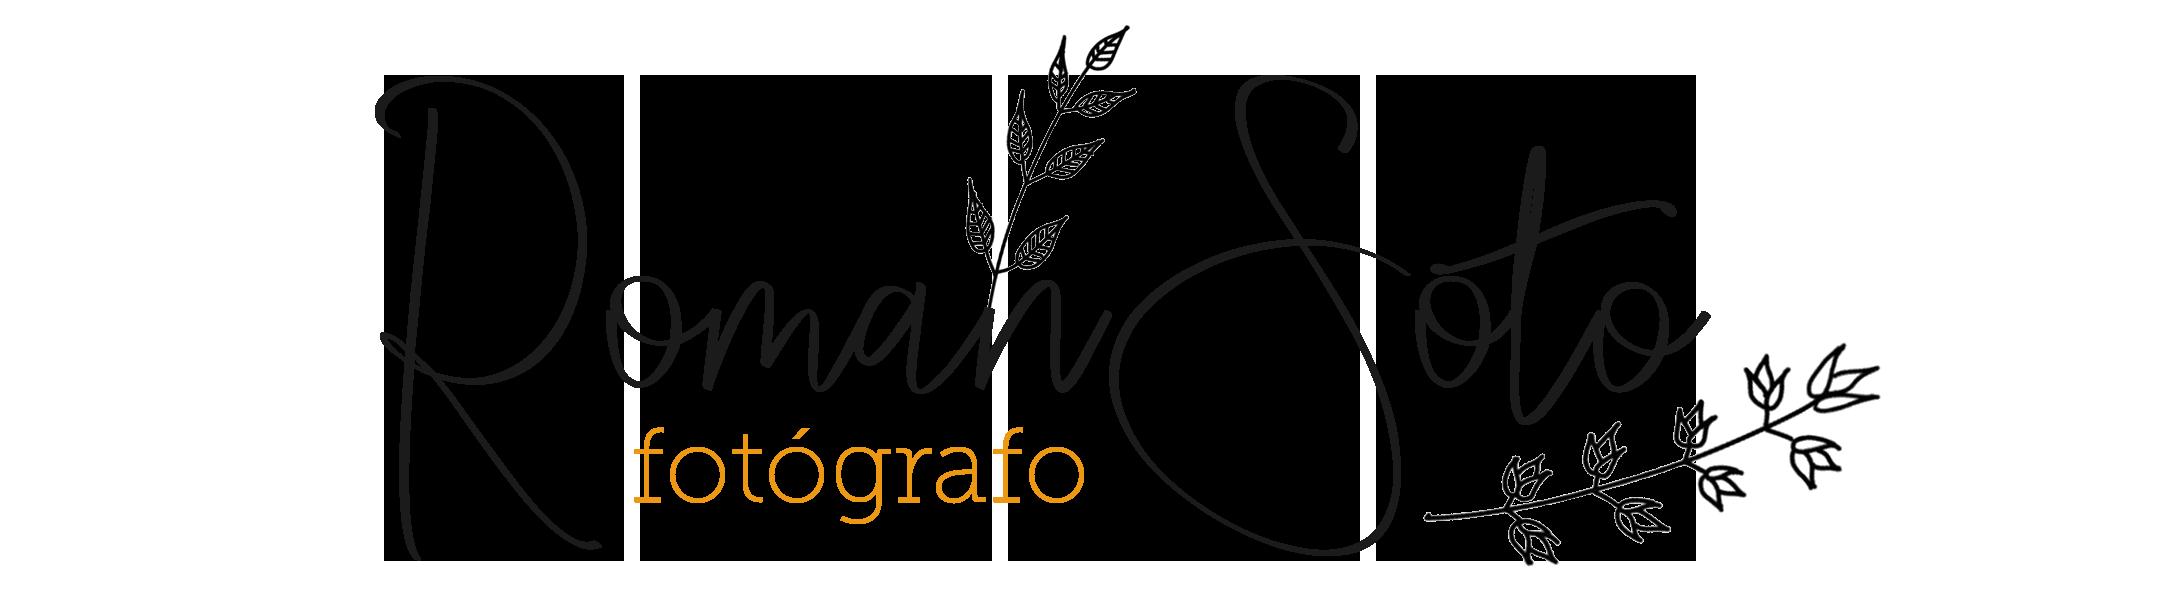 Roman Soto logo